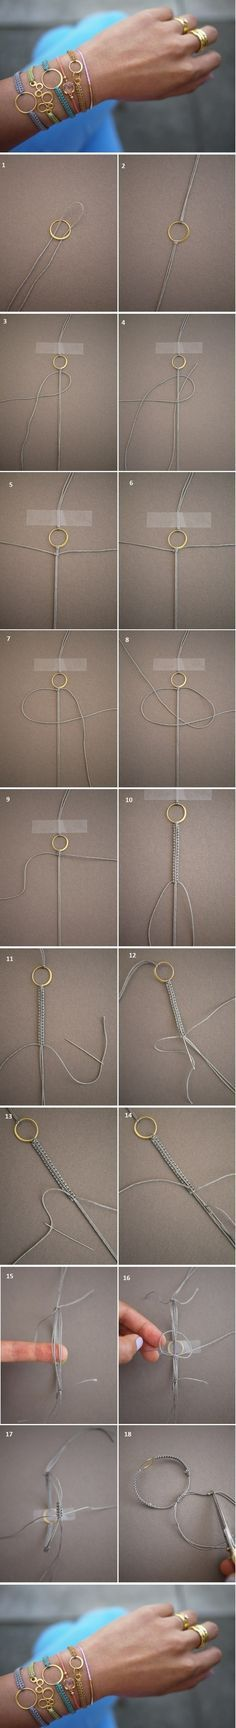 DIY bracelets. I want to make these